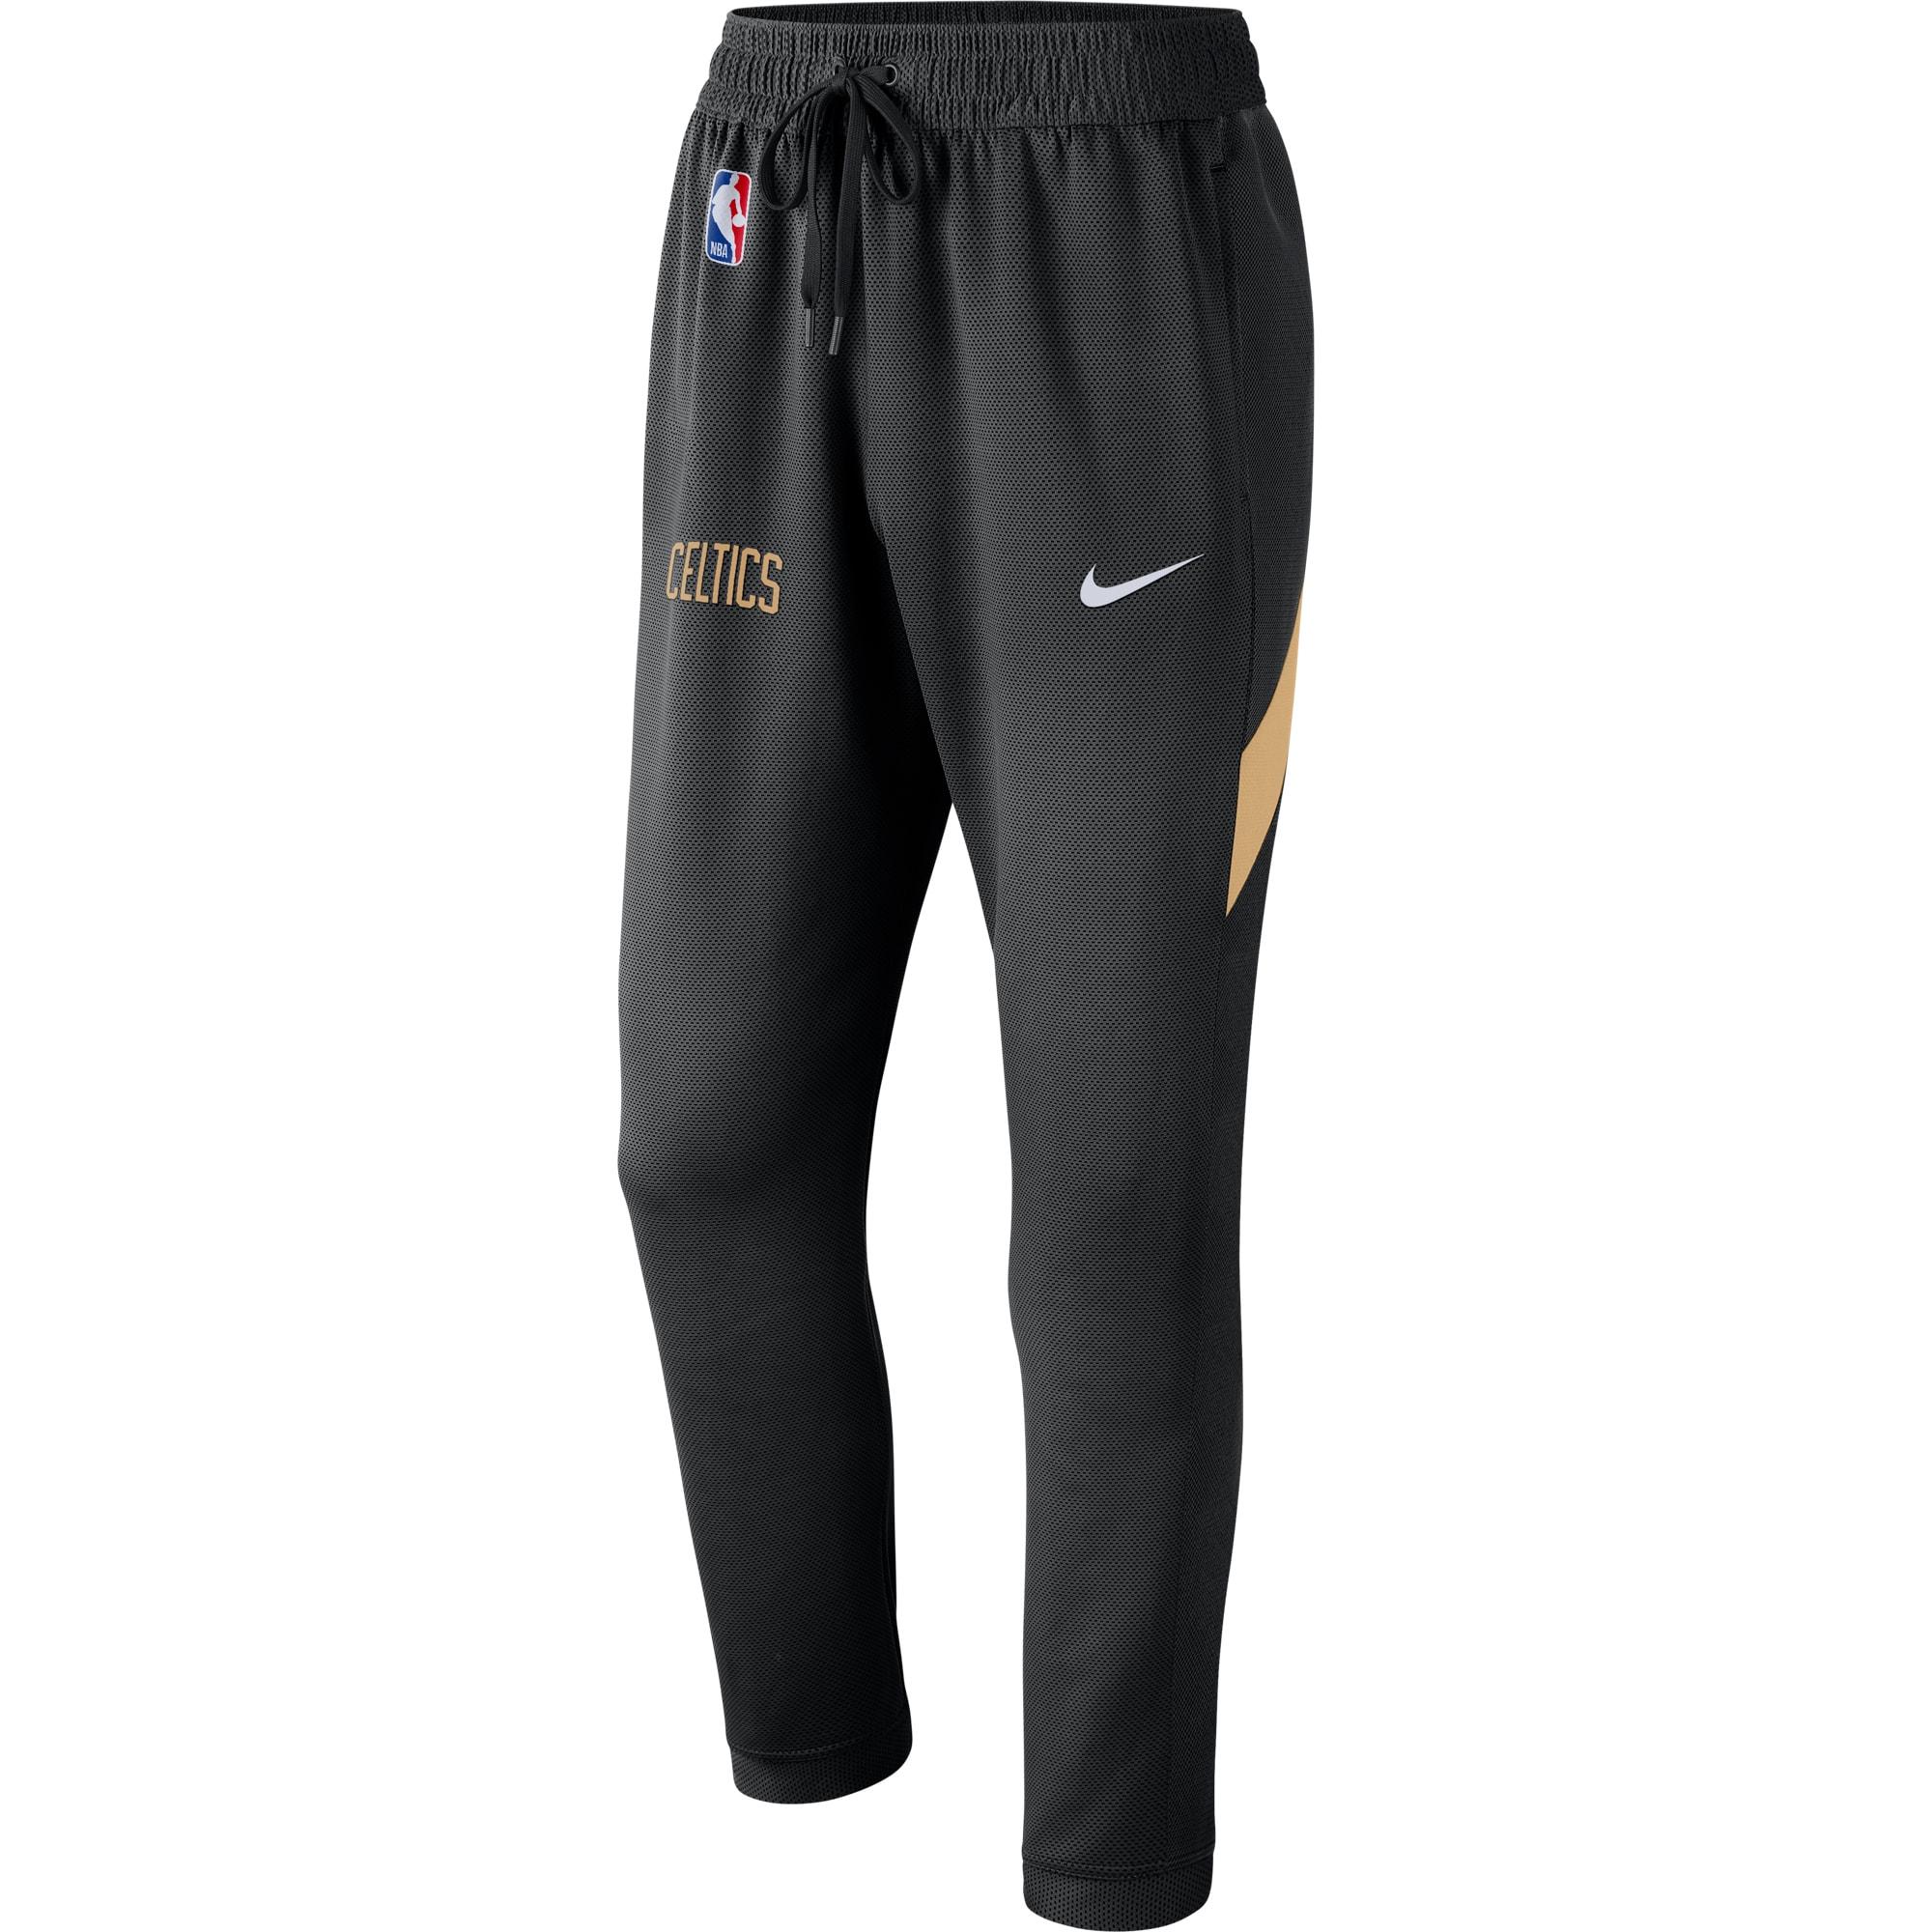 Boston Celtics Nike 2019/20 Earned Edition Showtime Performance Pants - Black/Gold